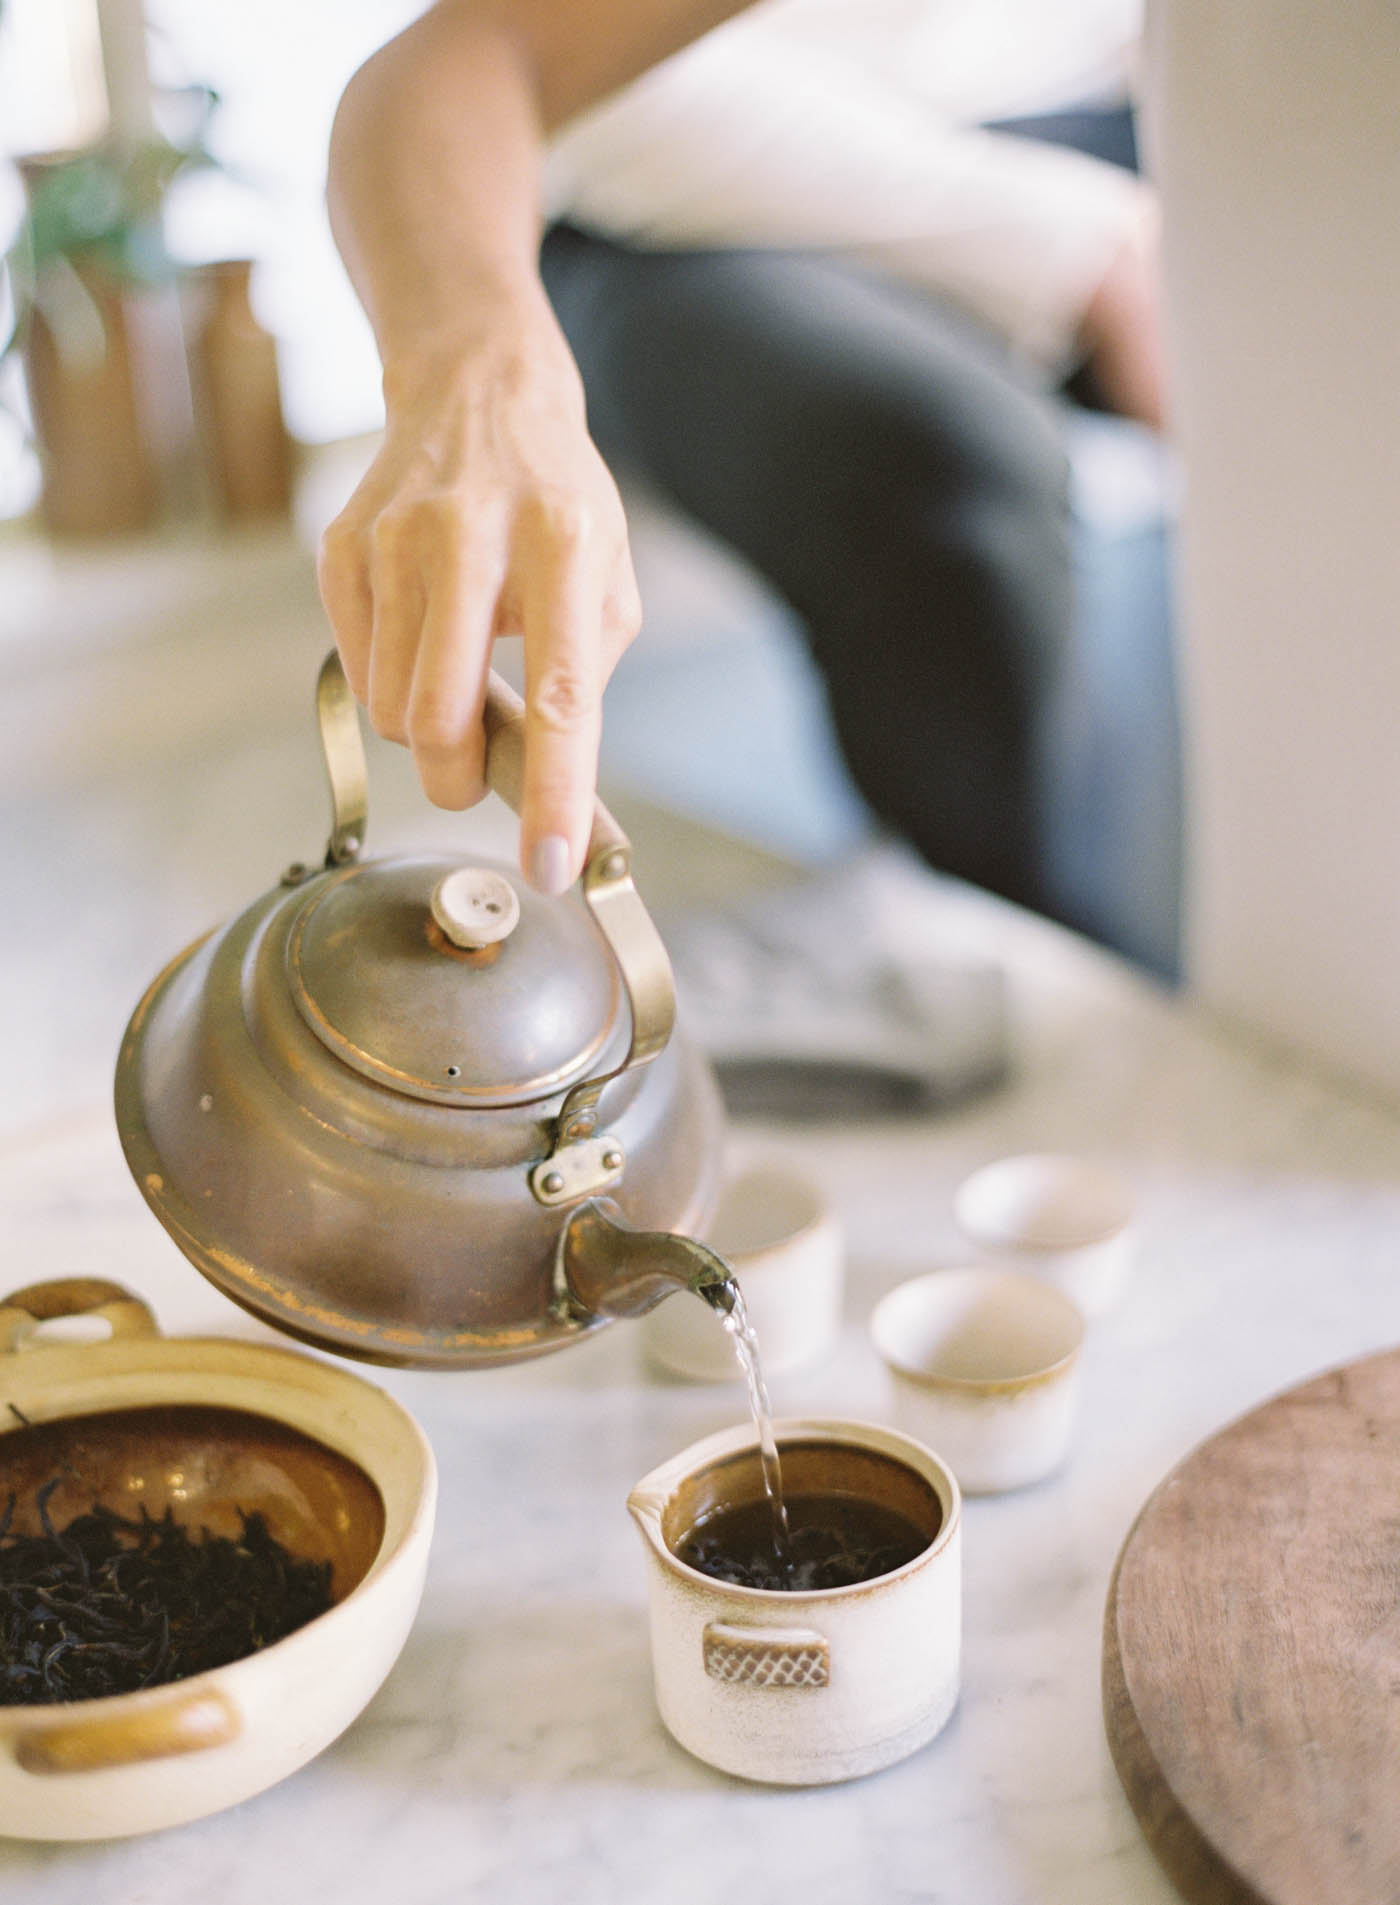 riviera-house-engagement-110-Jen_Huang-Tea-Ceremony-383-Jen_Huang-004149-R1-012.jpg